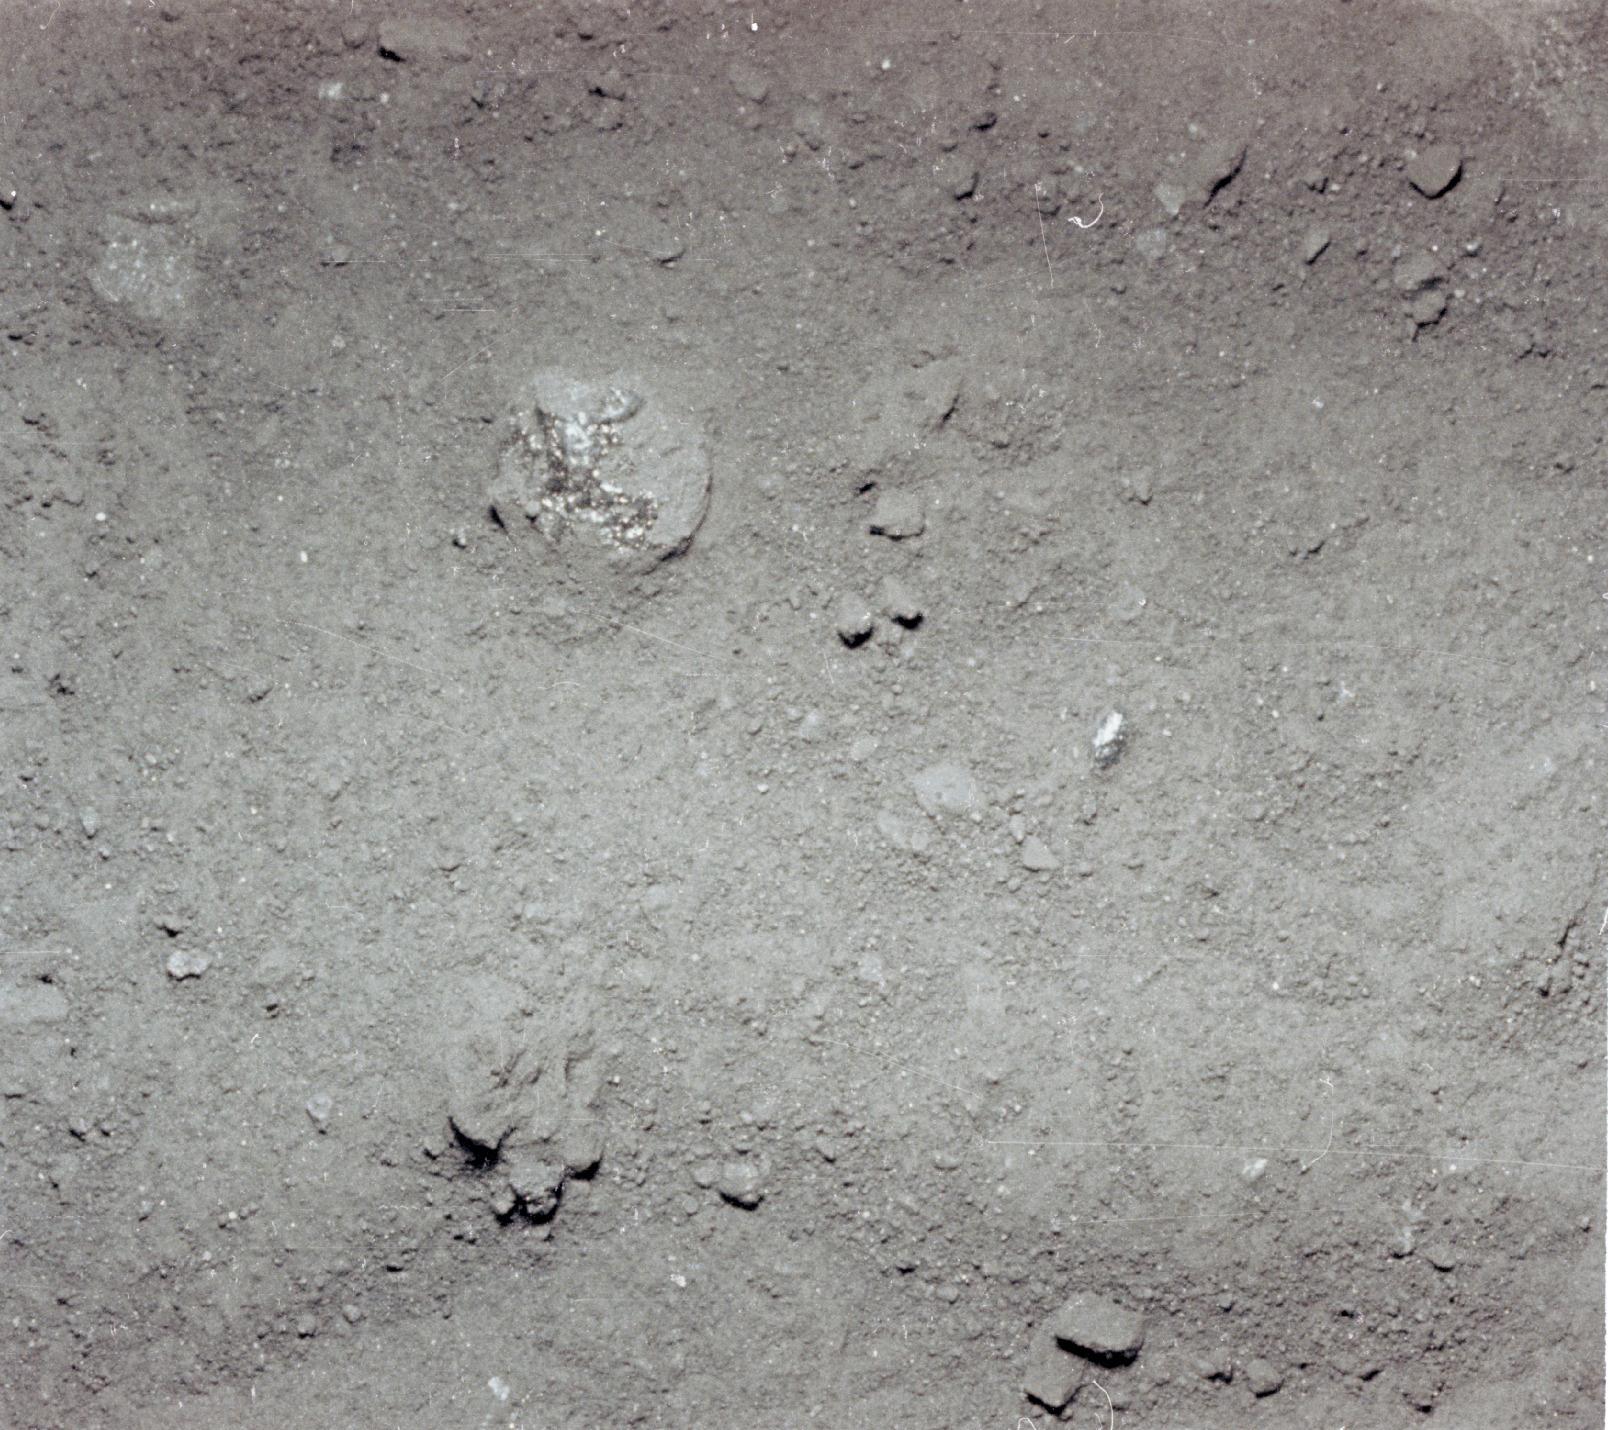 Lunar Soil Texture